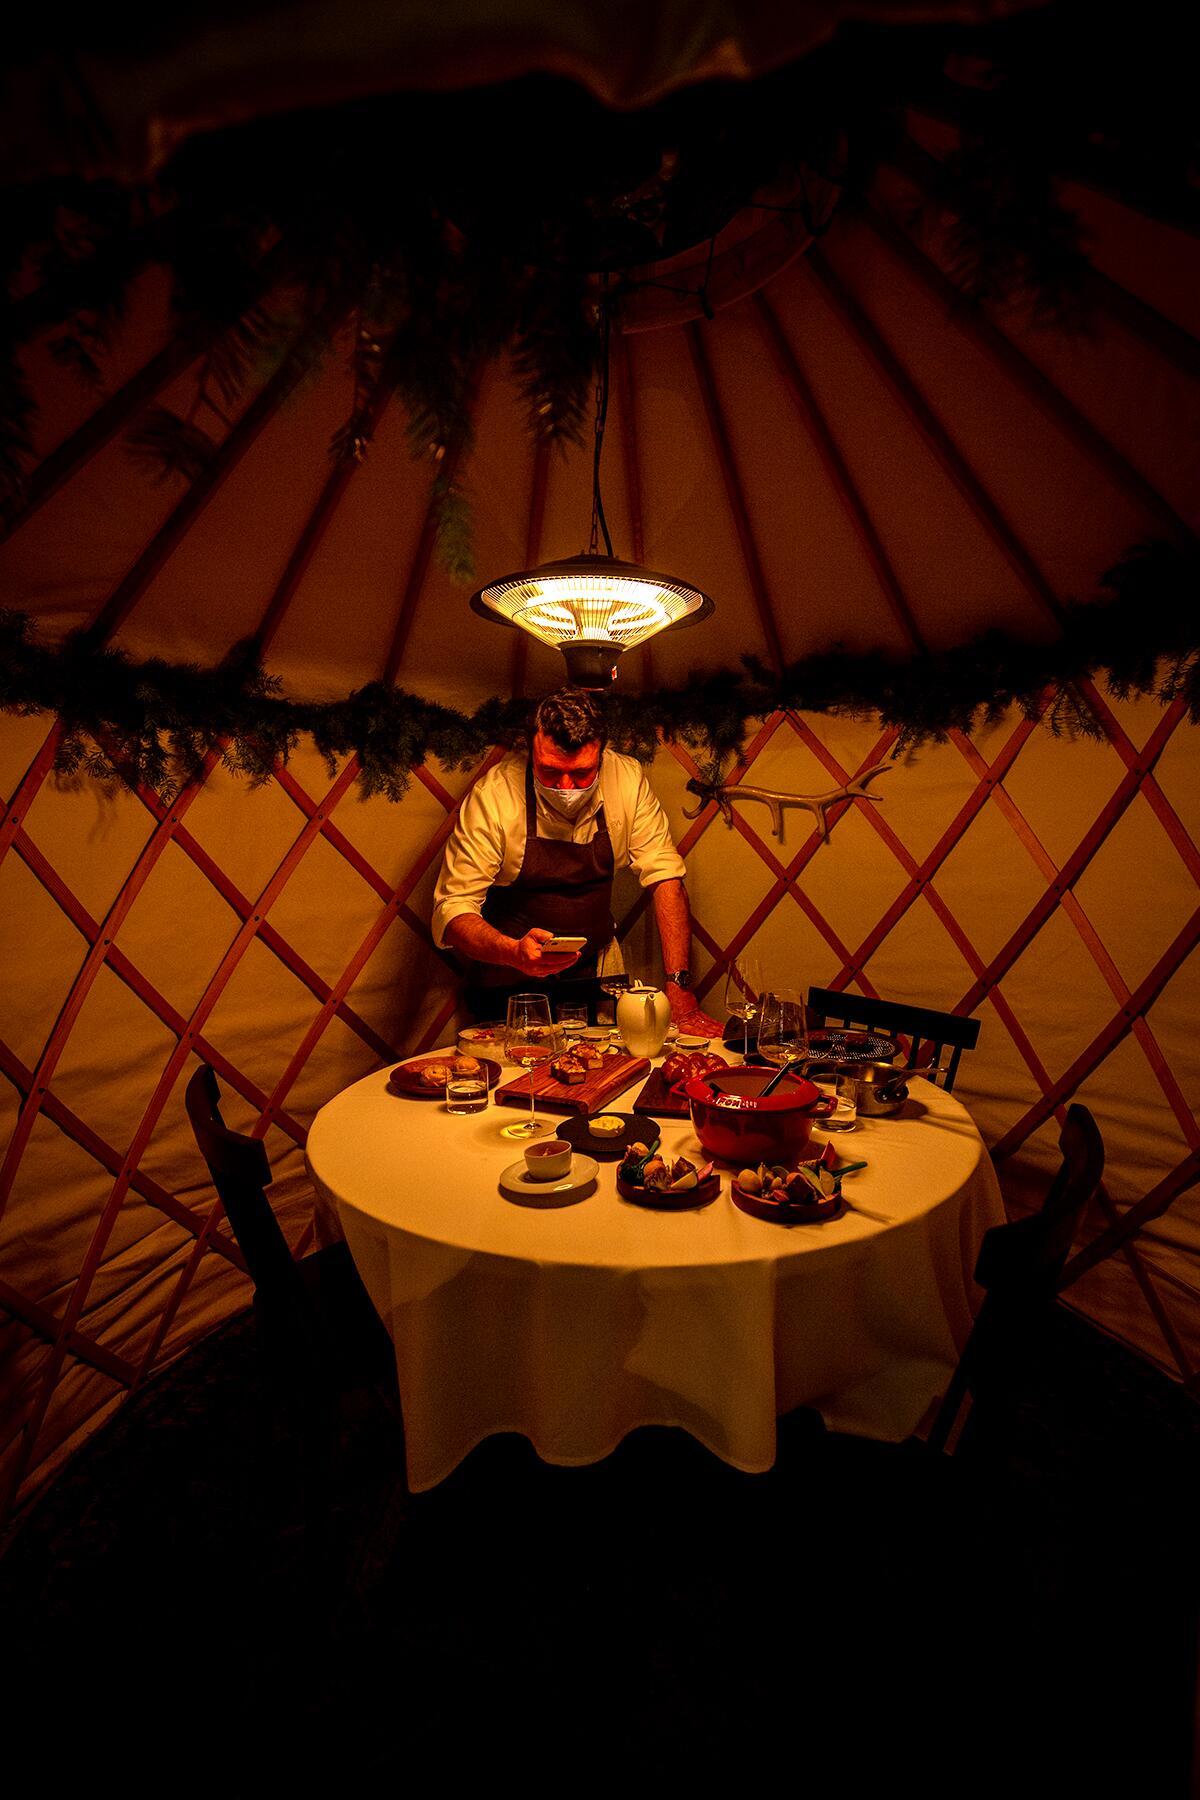 07_ItalianRestaurantsUS__Frasca_7 M THURK_3858